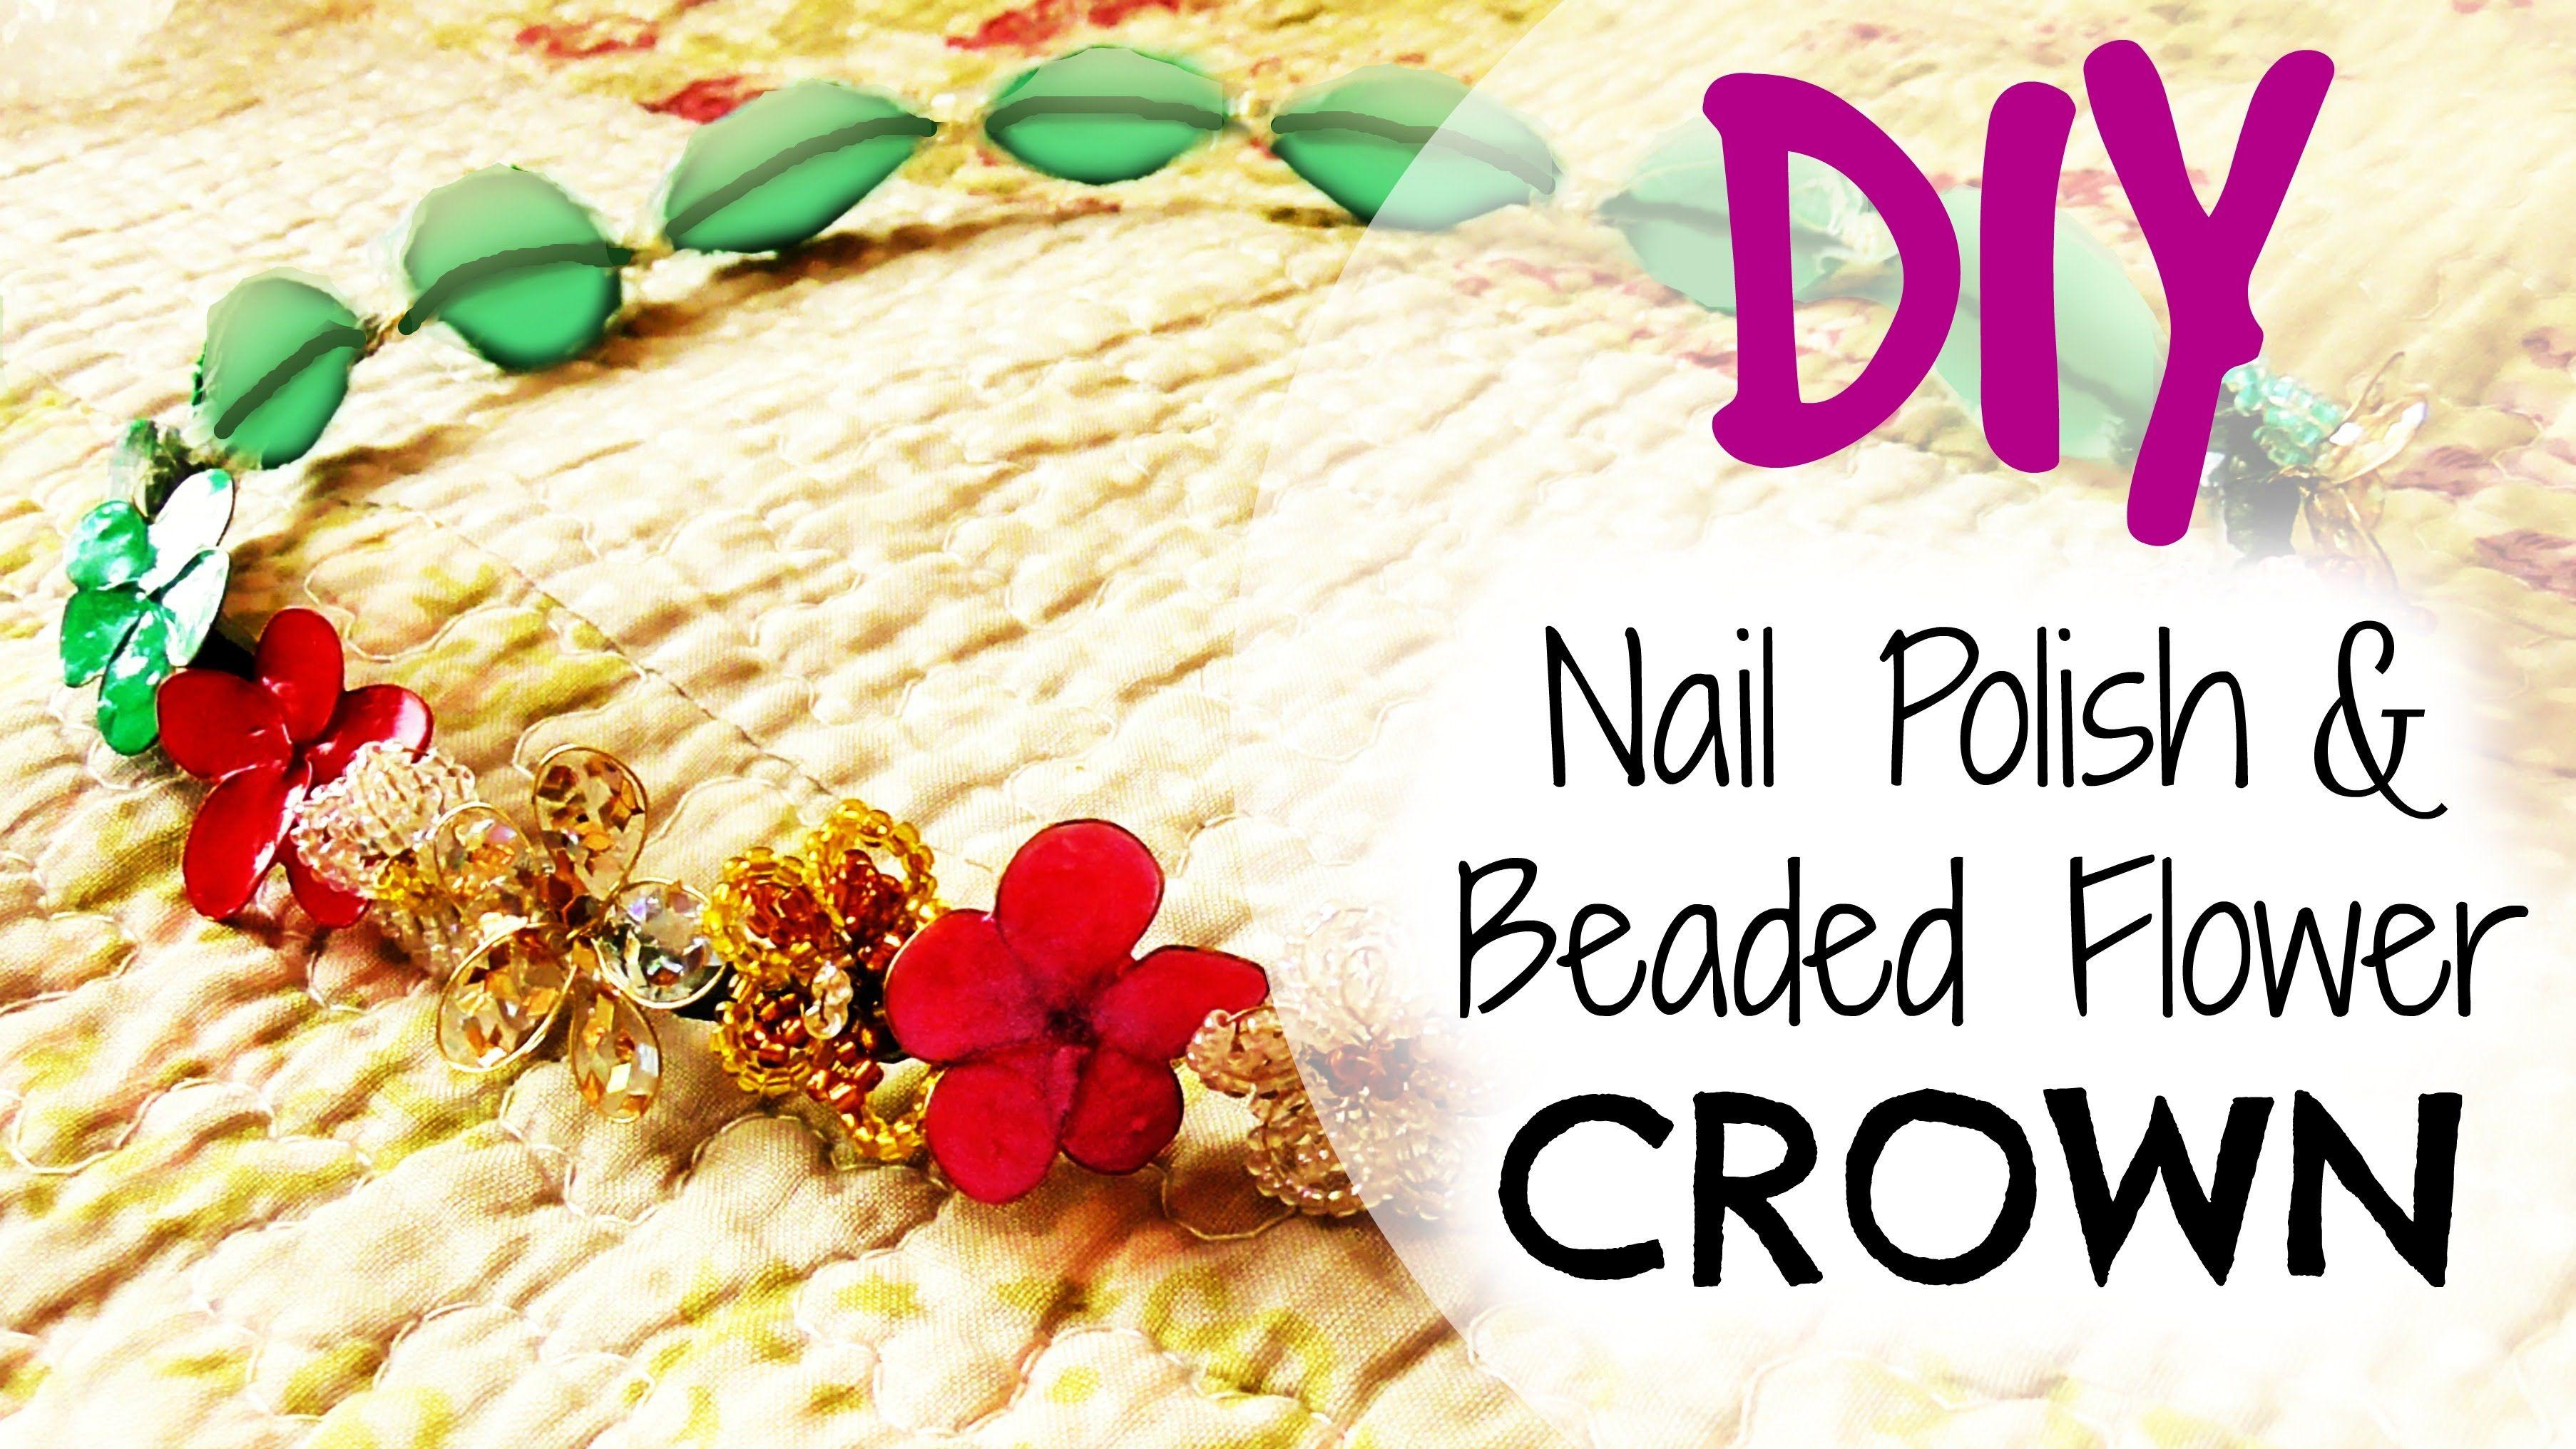 Diy Nail Polish Beaded Flower Crown Rina Knish Diy Videos That